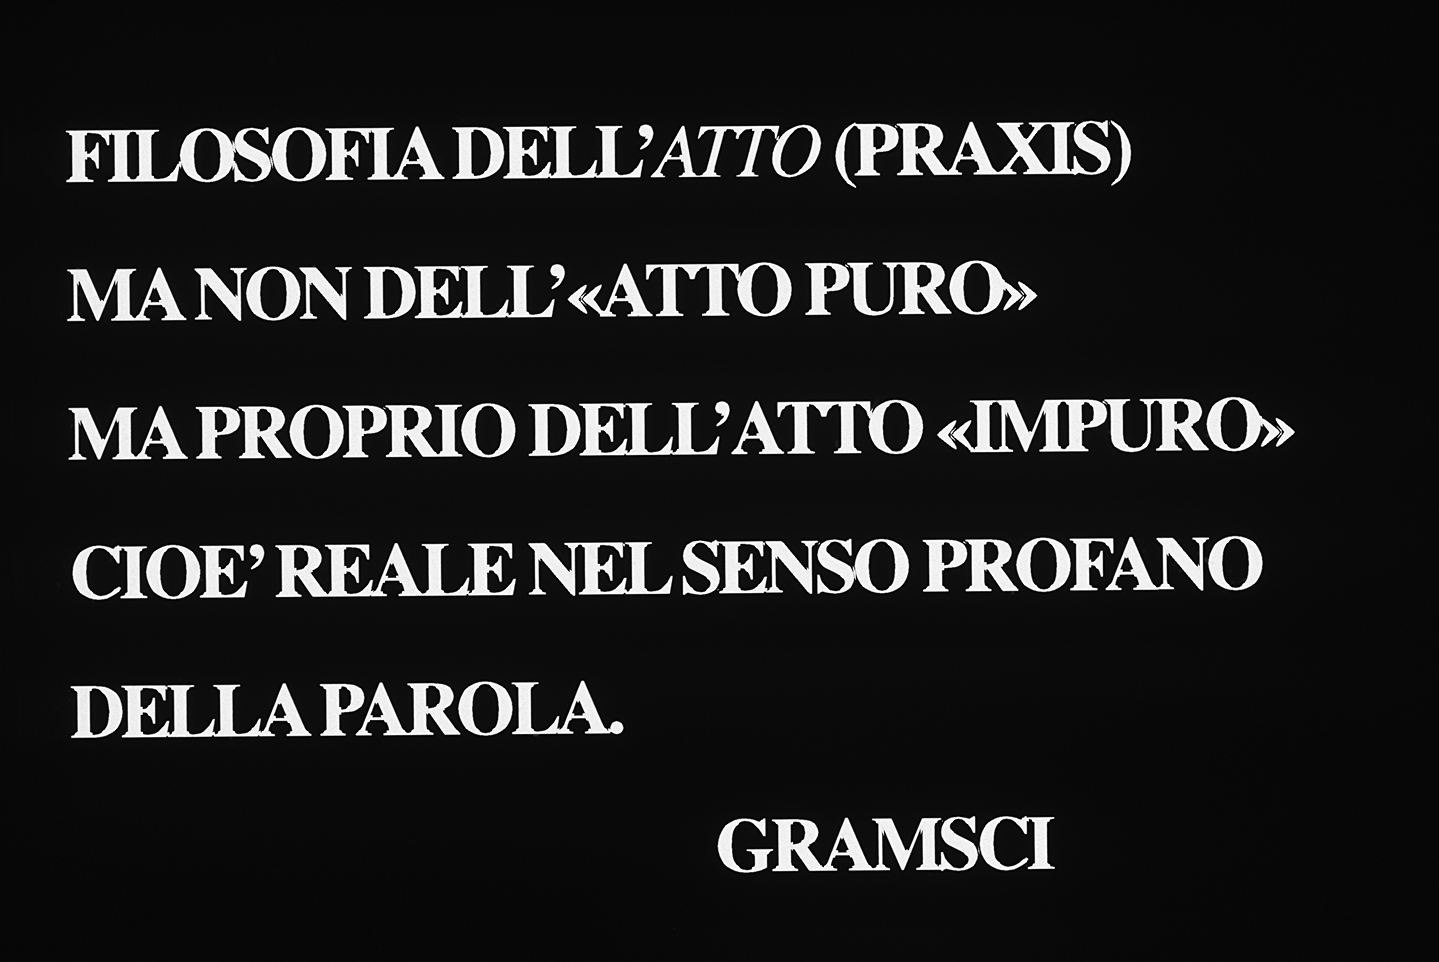 Praxis - particolare